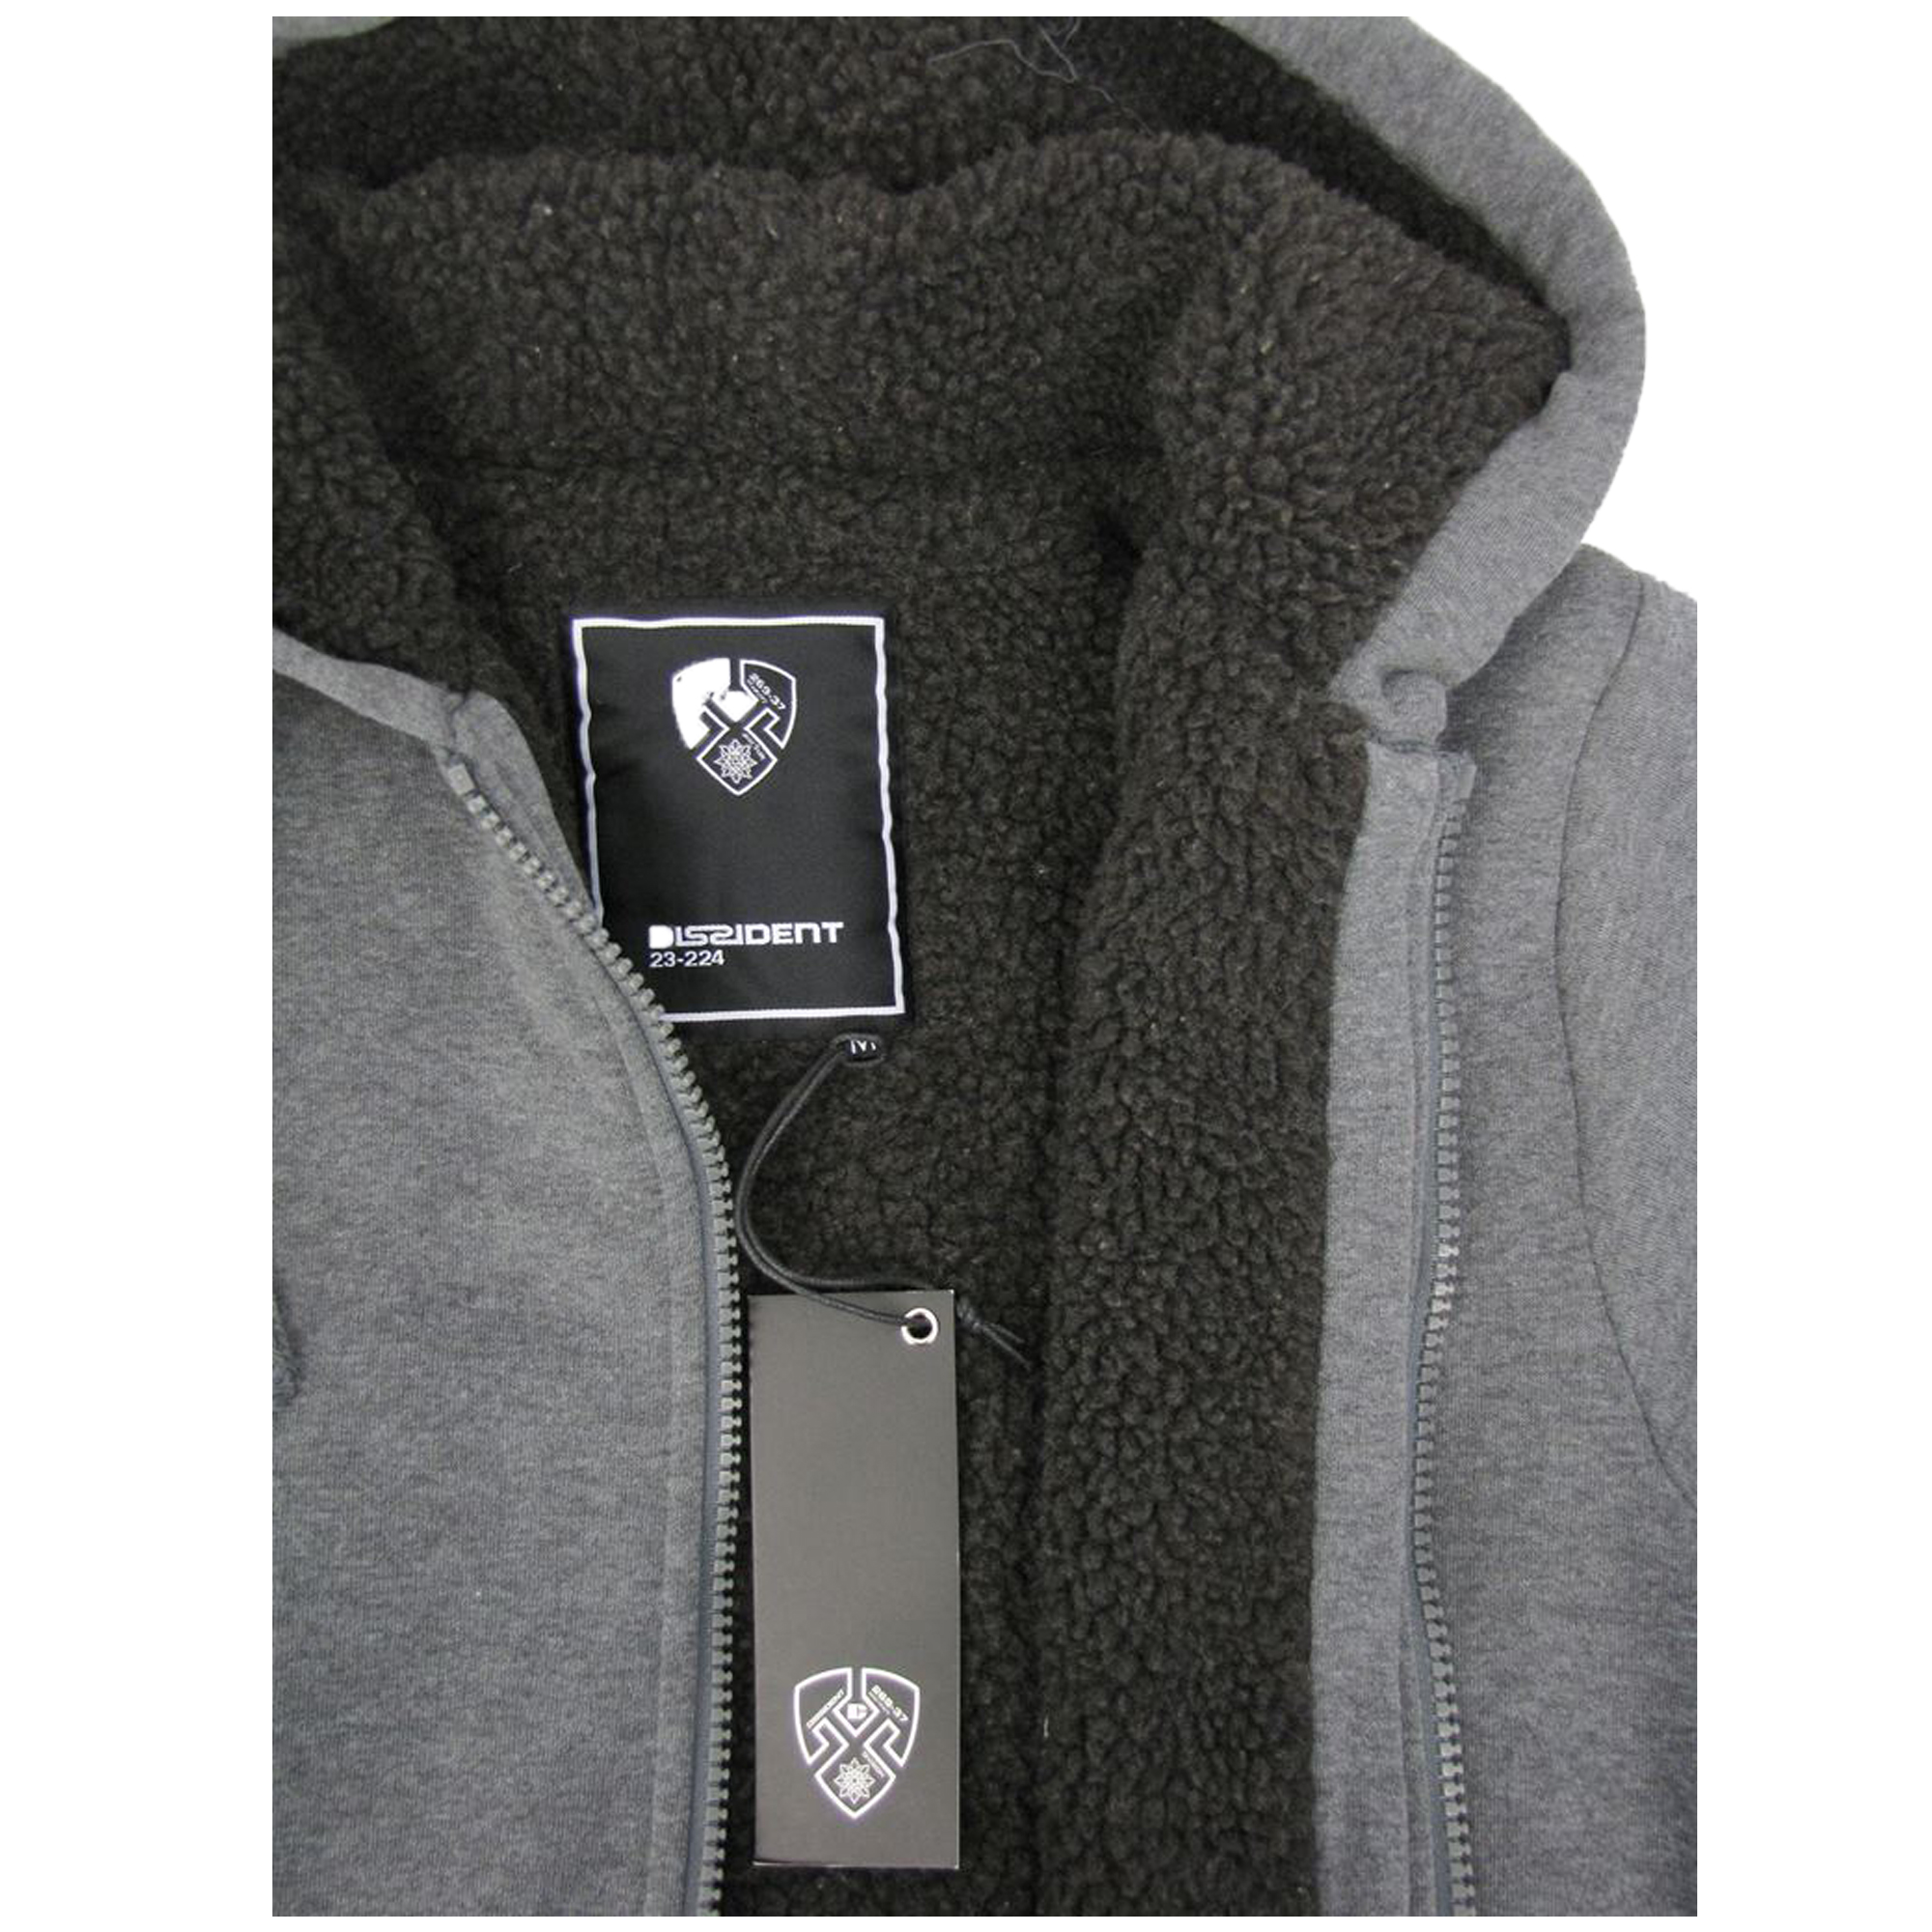 Mens-Jacket-Dissident-Sweatshirt-Hooded-Top-Sherpa-Fleece-Lined-Heavy-BOLO-New thumbnail 14